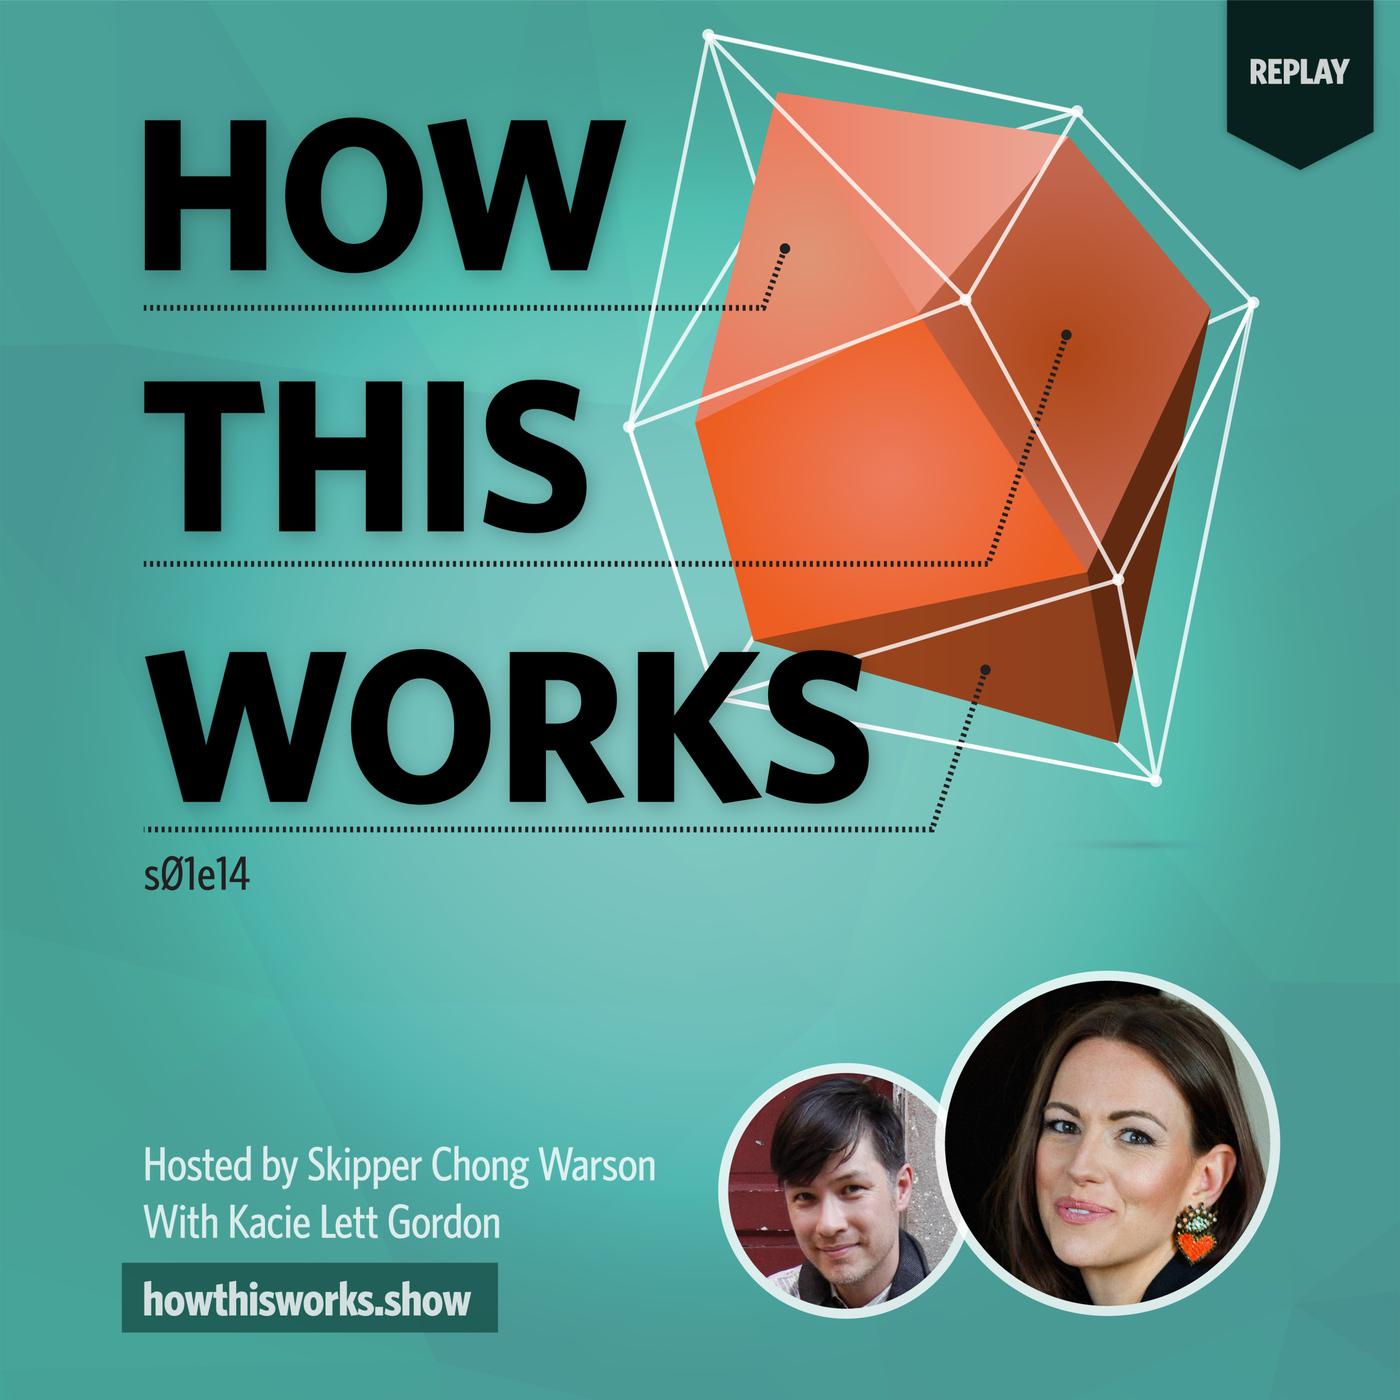 How This Works 014-kacie-lett-gordon-replay: Kacie Lett Gordon (replay)